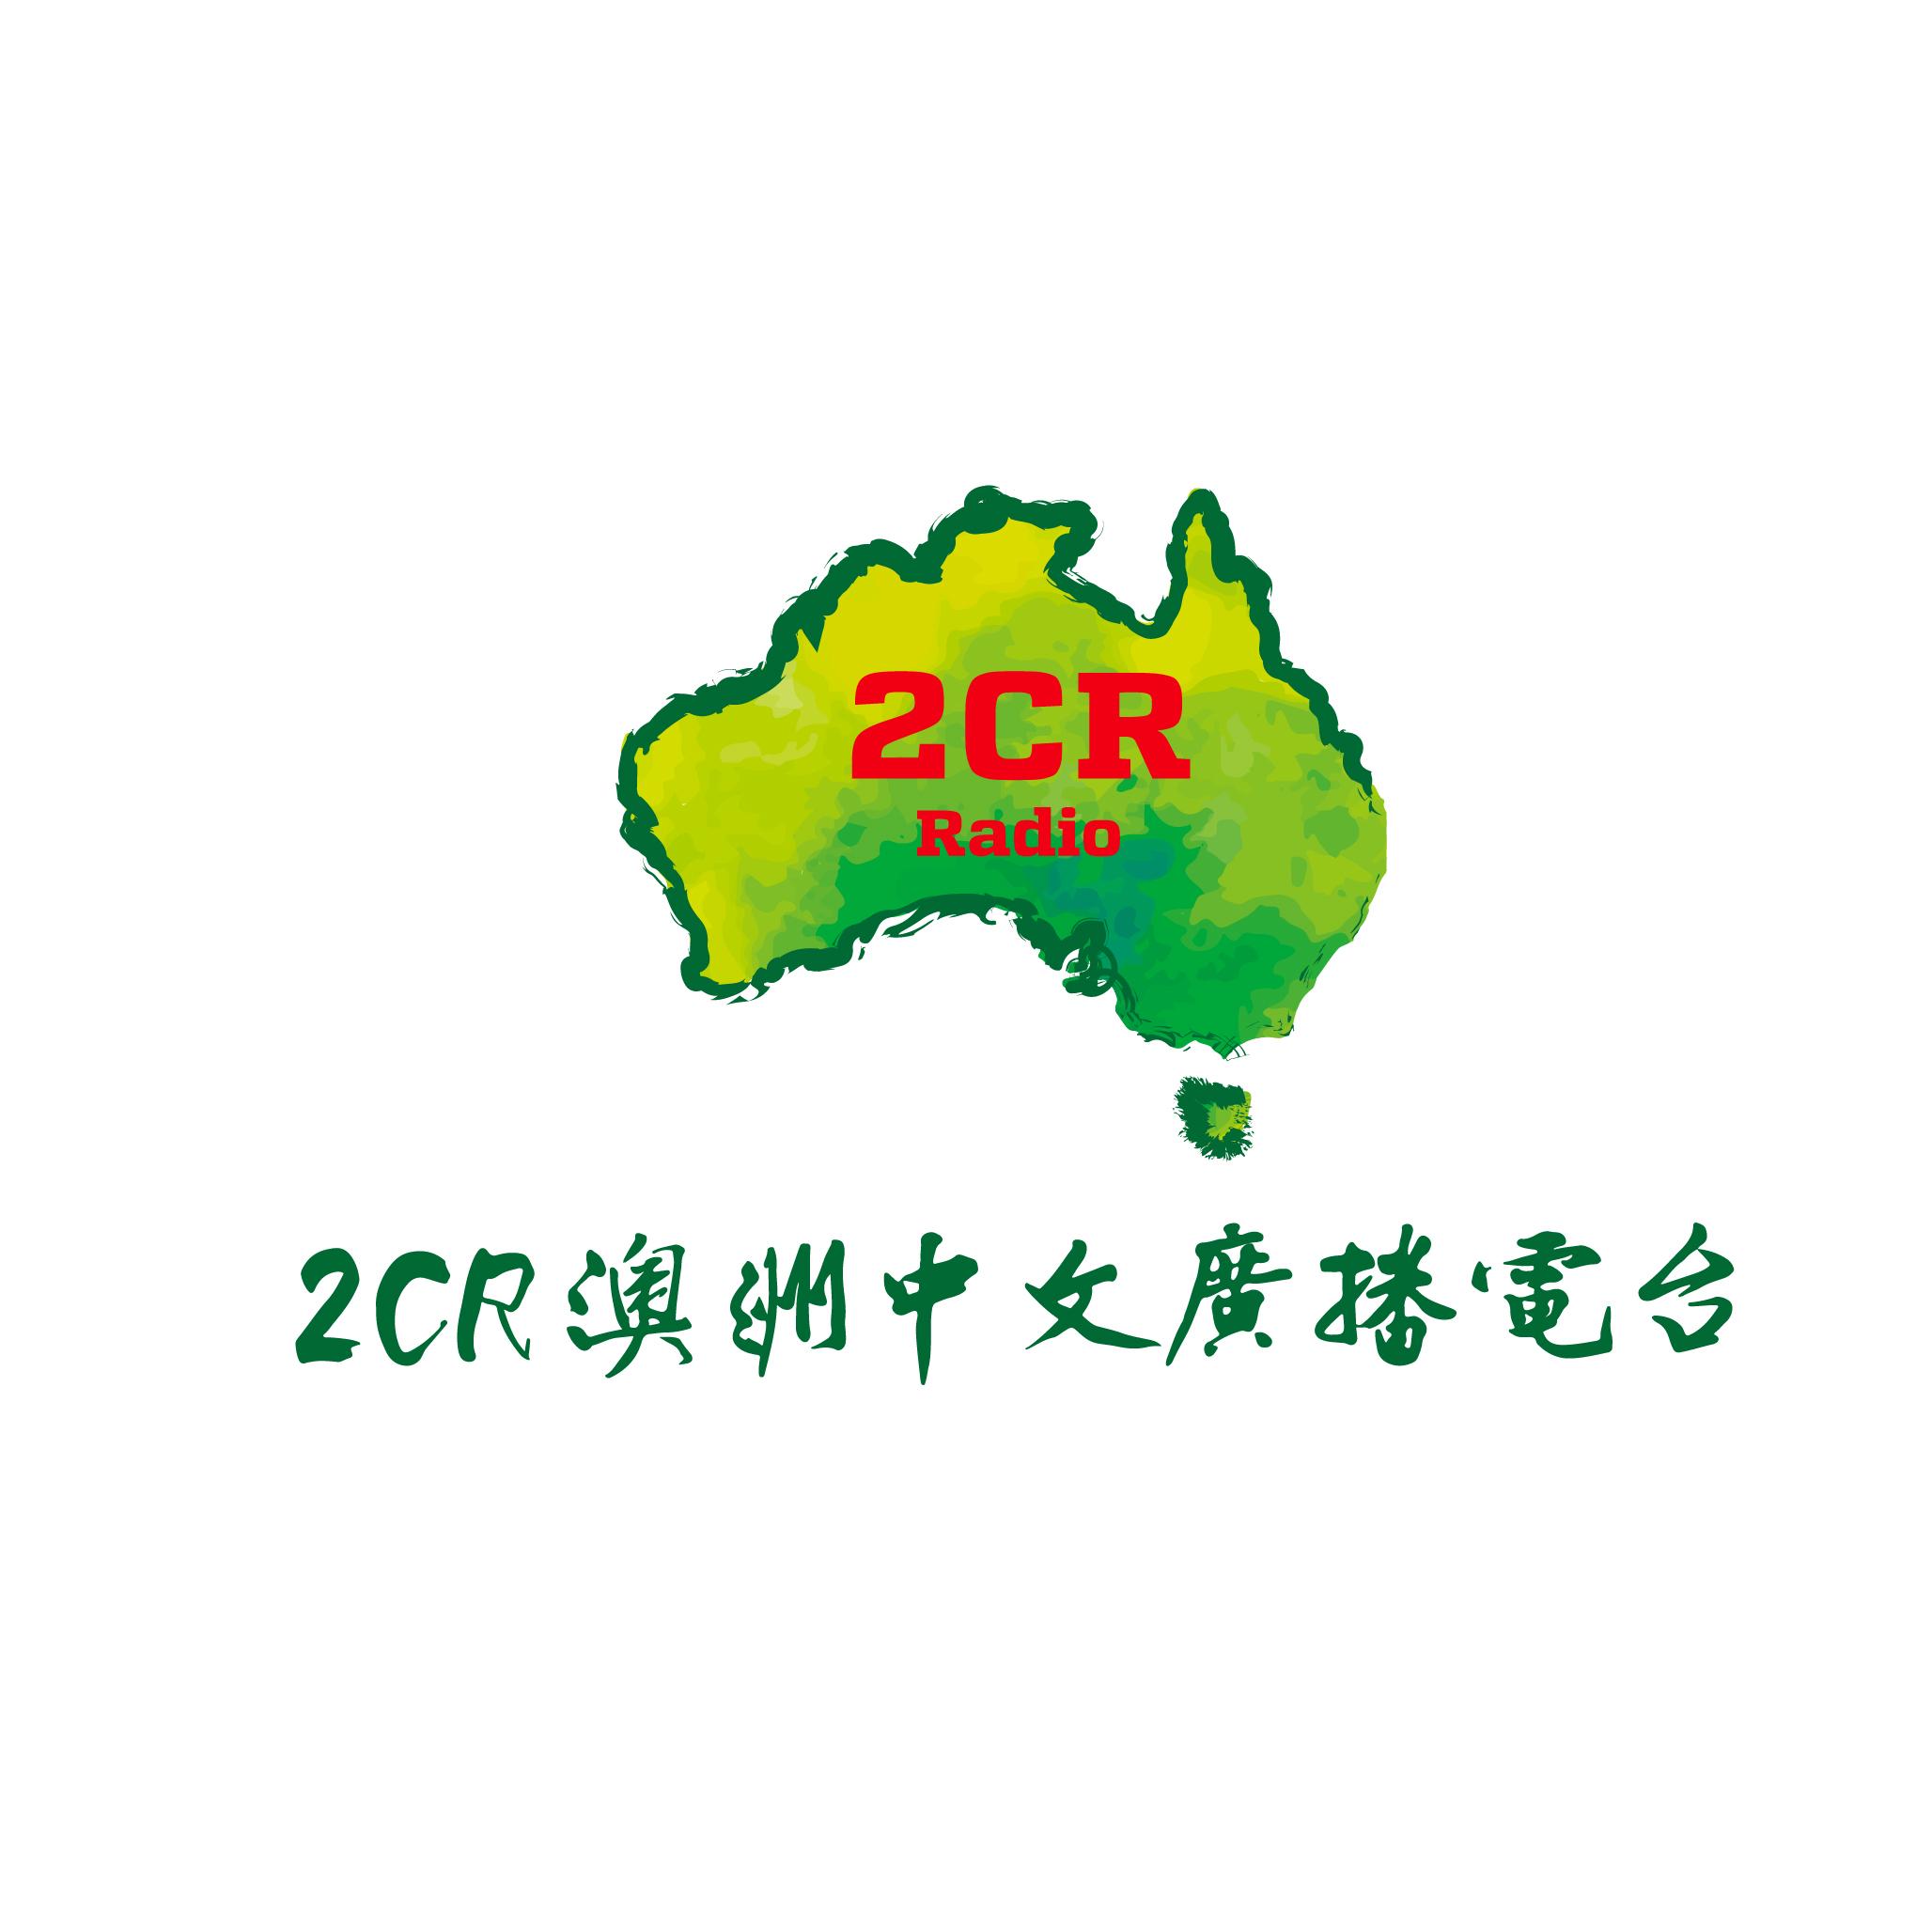 2CR Australia Chinese Radio Station